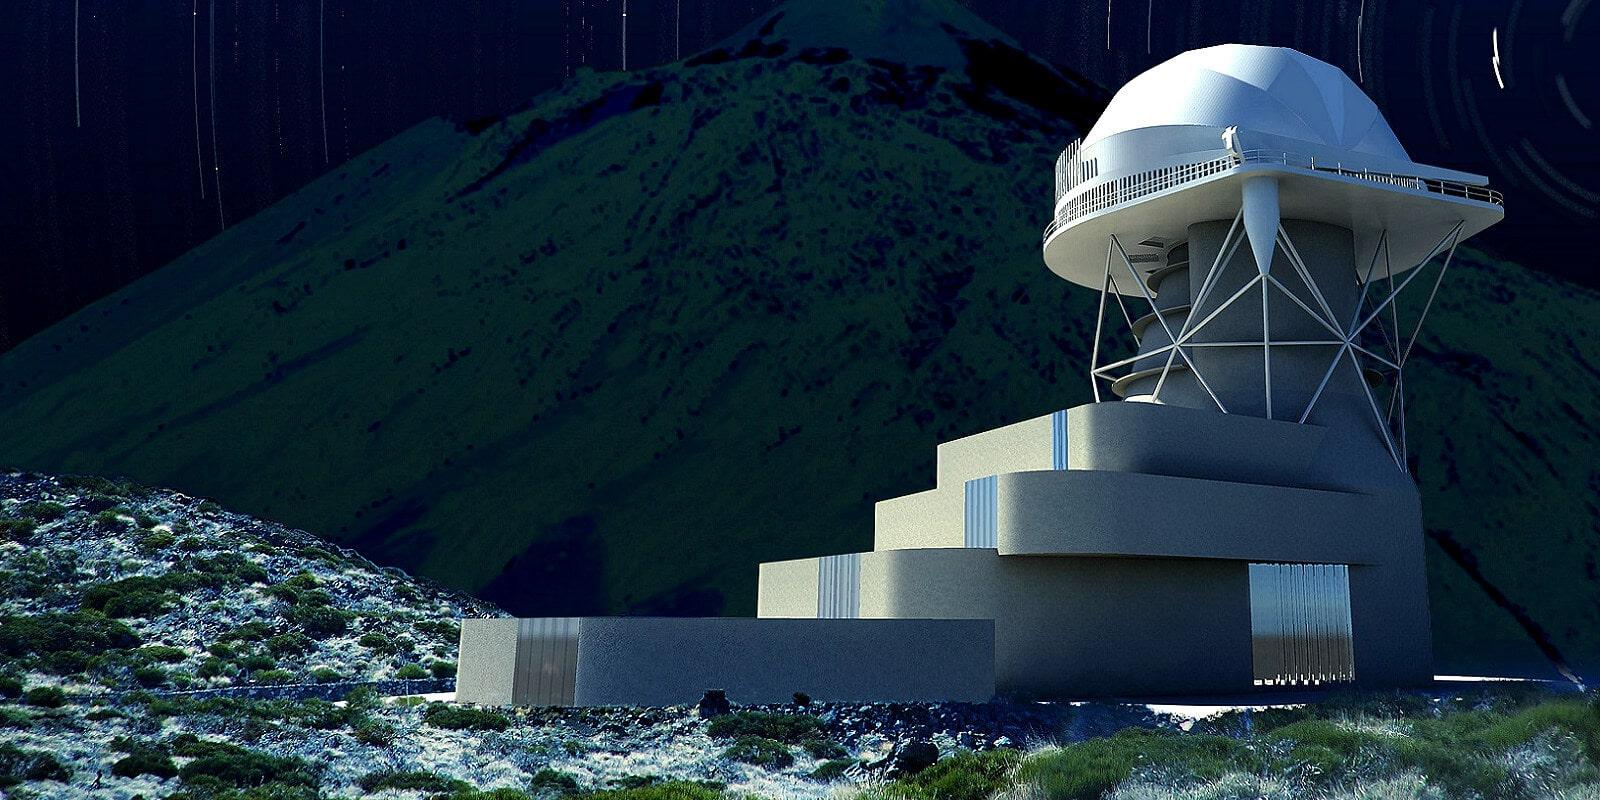 EST_European_Solar_Telescope_Canary_Islands_IDOM_ADA_5_